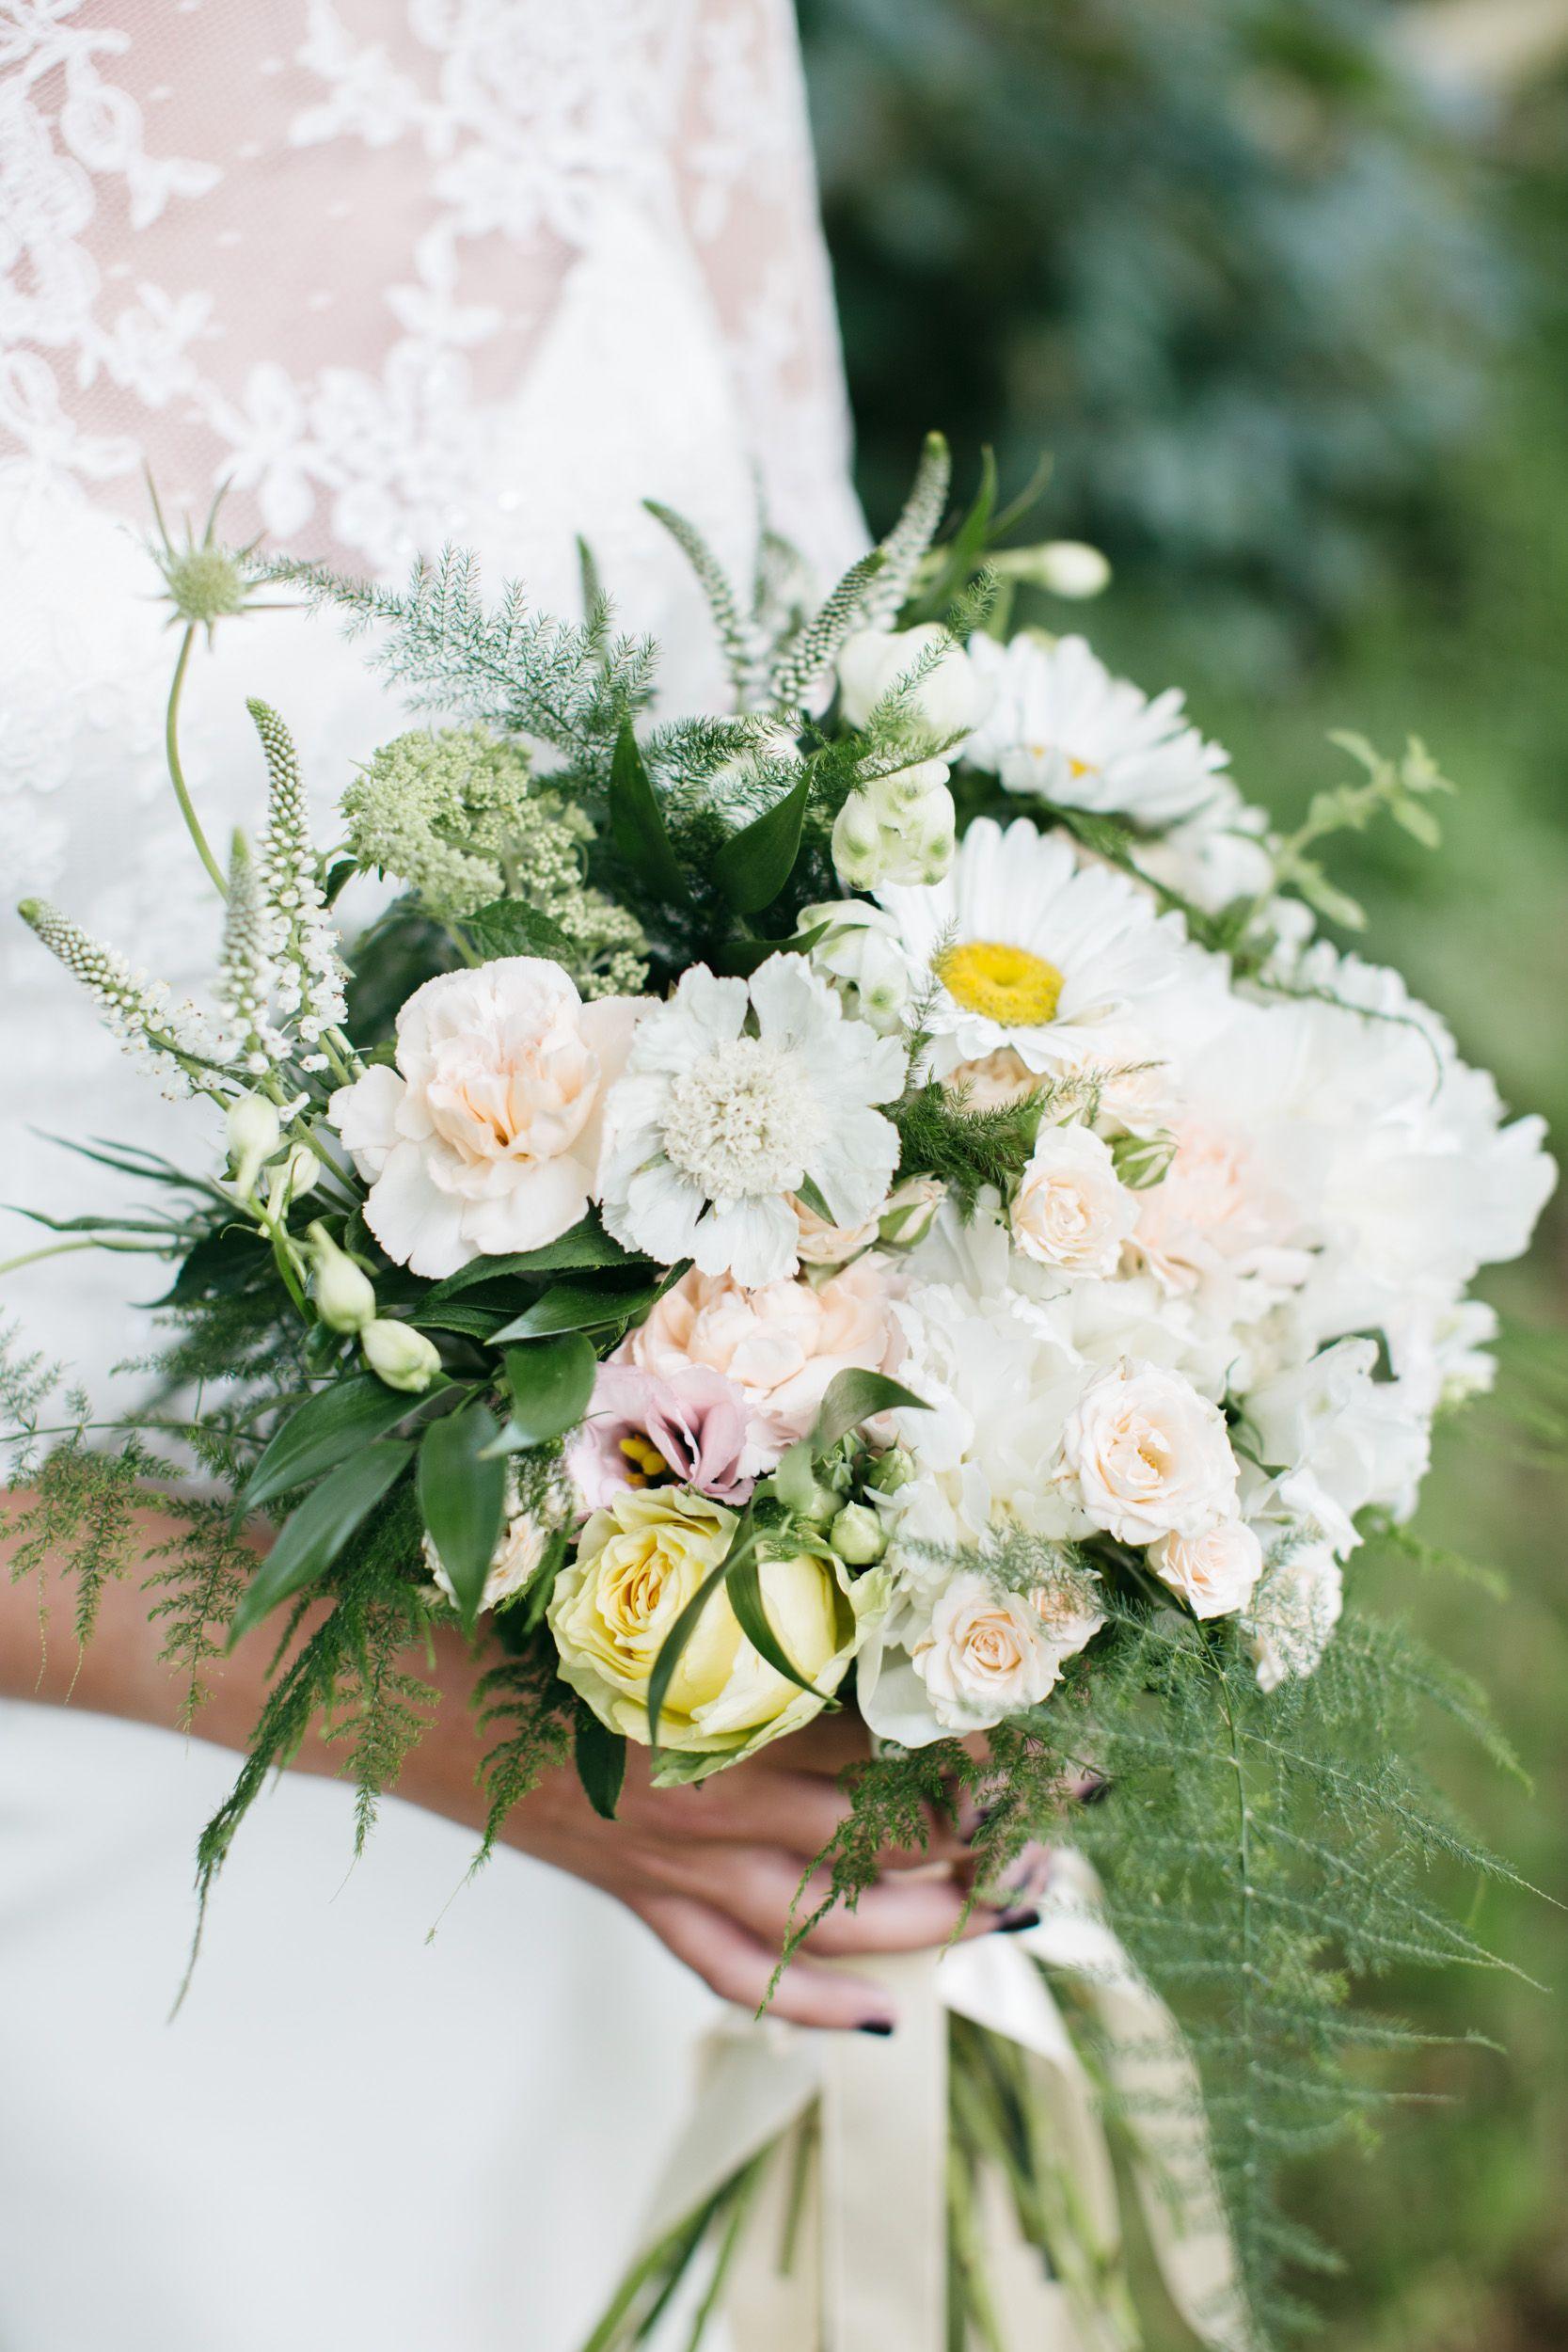 Wedding Flowers Wedding Bridal Blush Pink White Green Daisy Flower